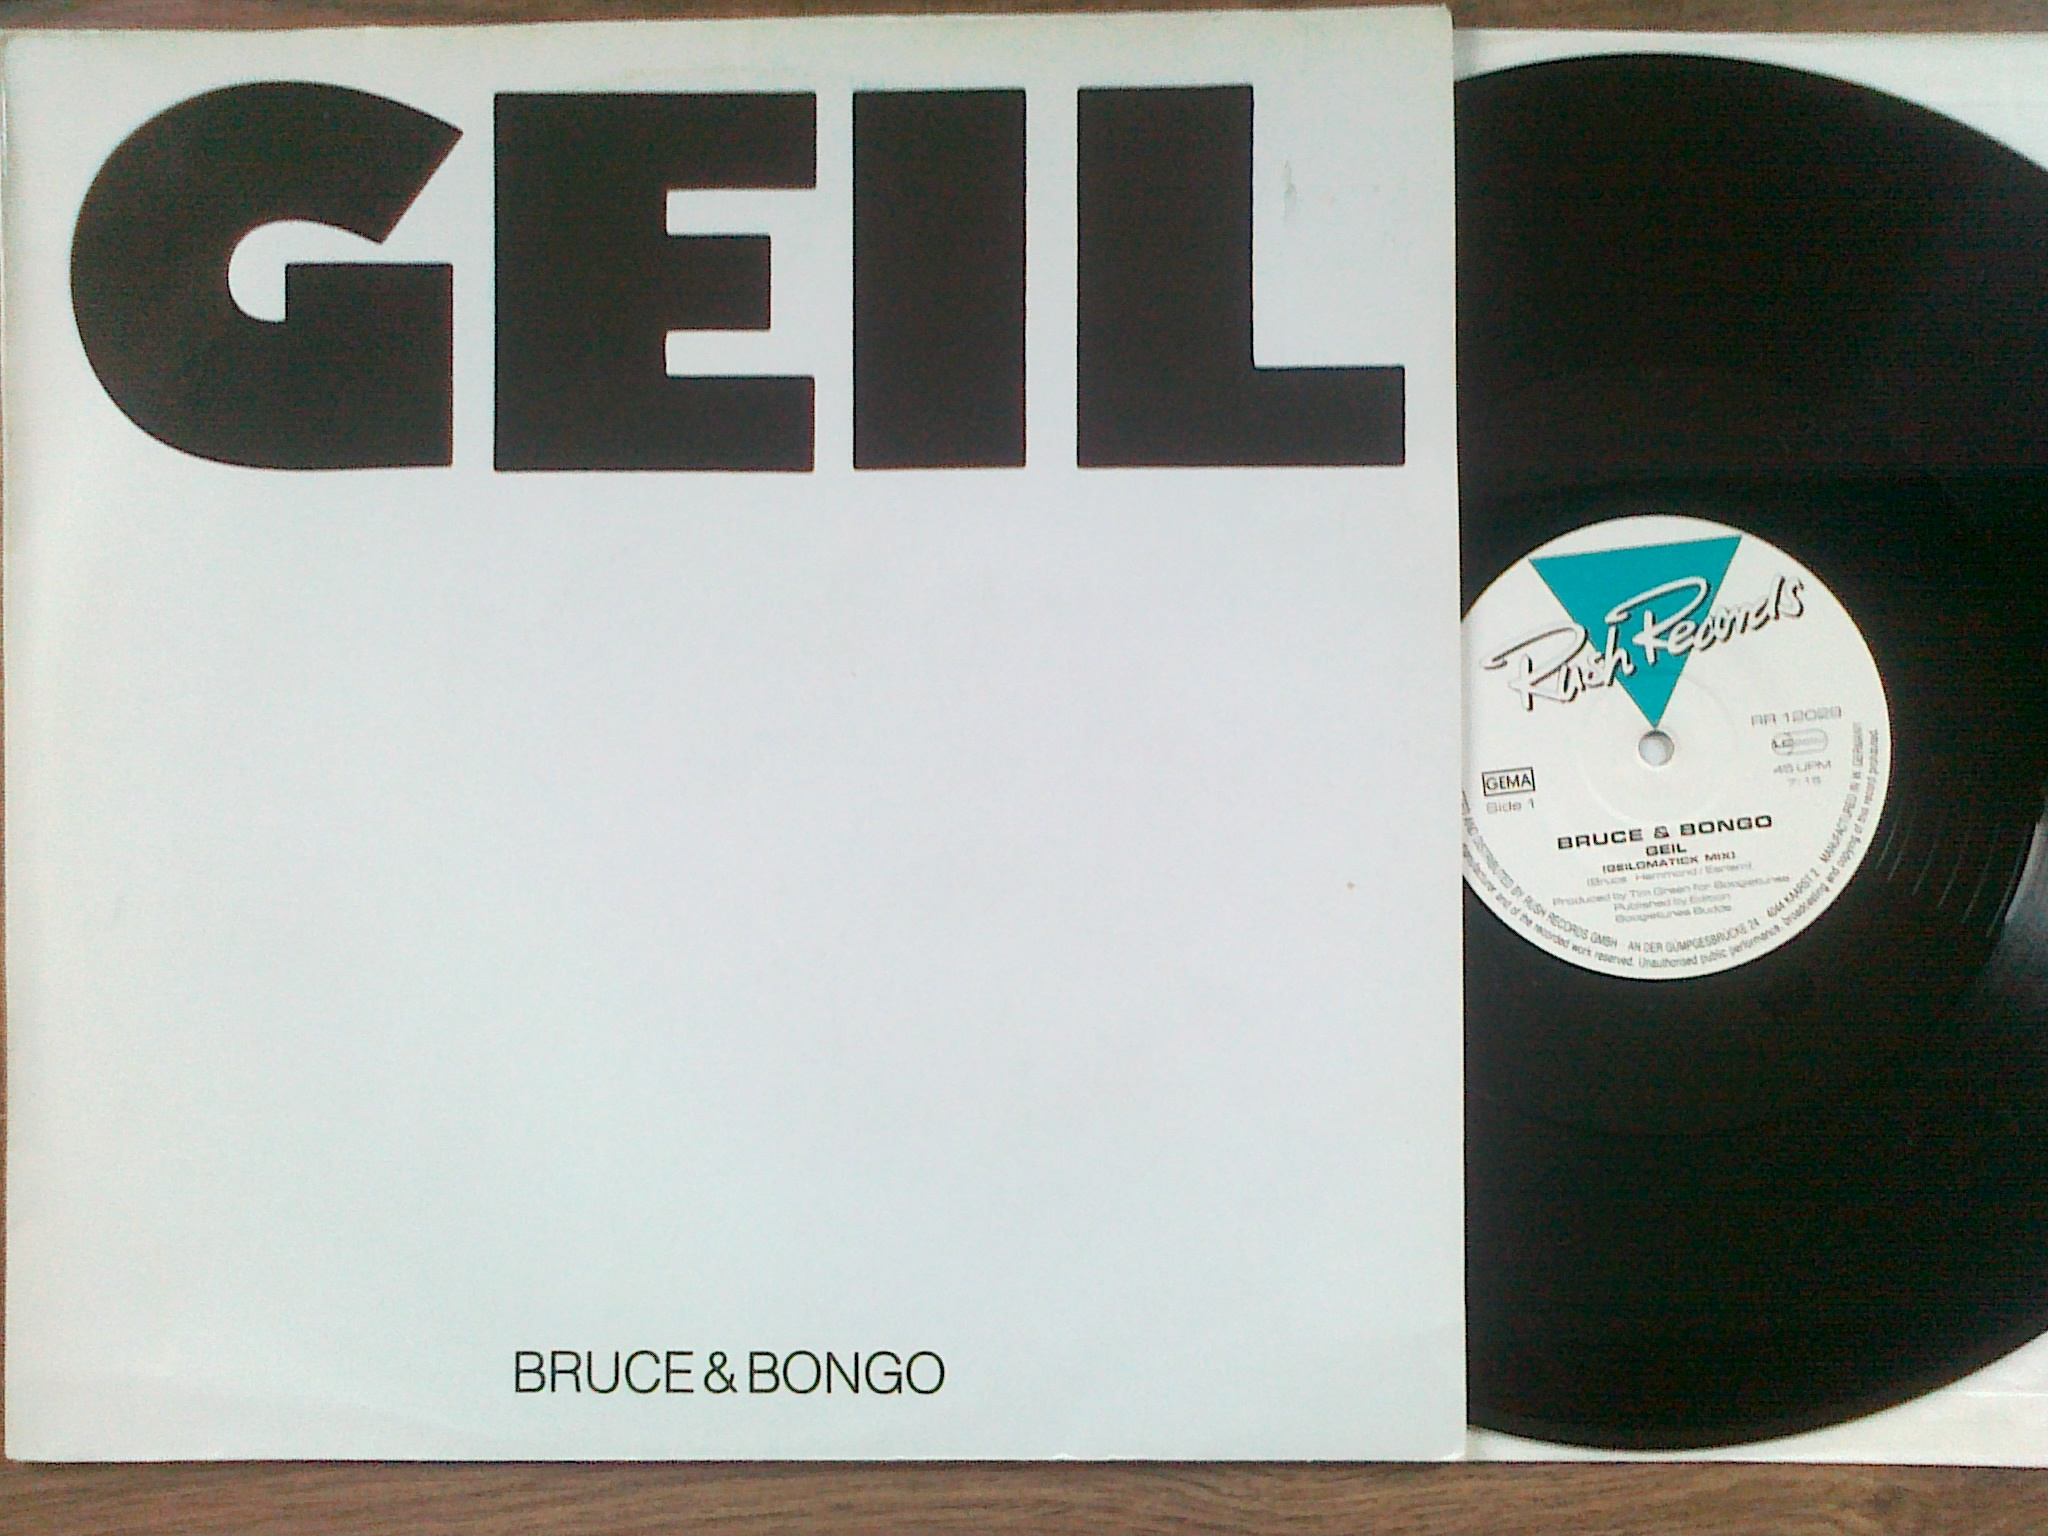 Bruce and  Bongo - Geil